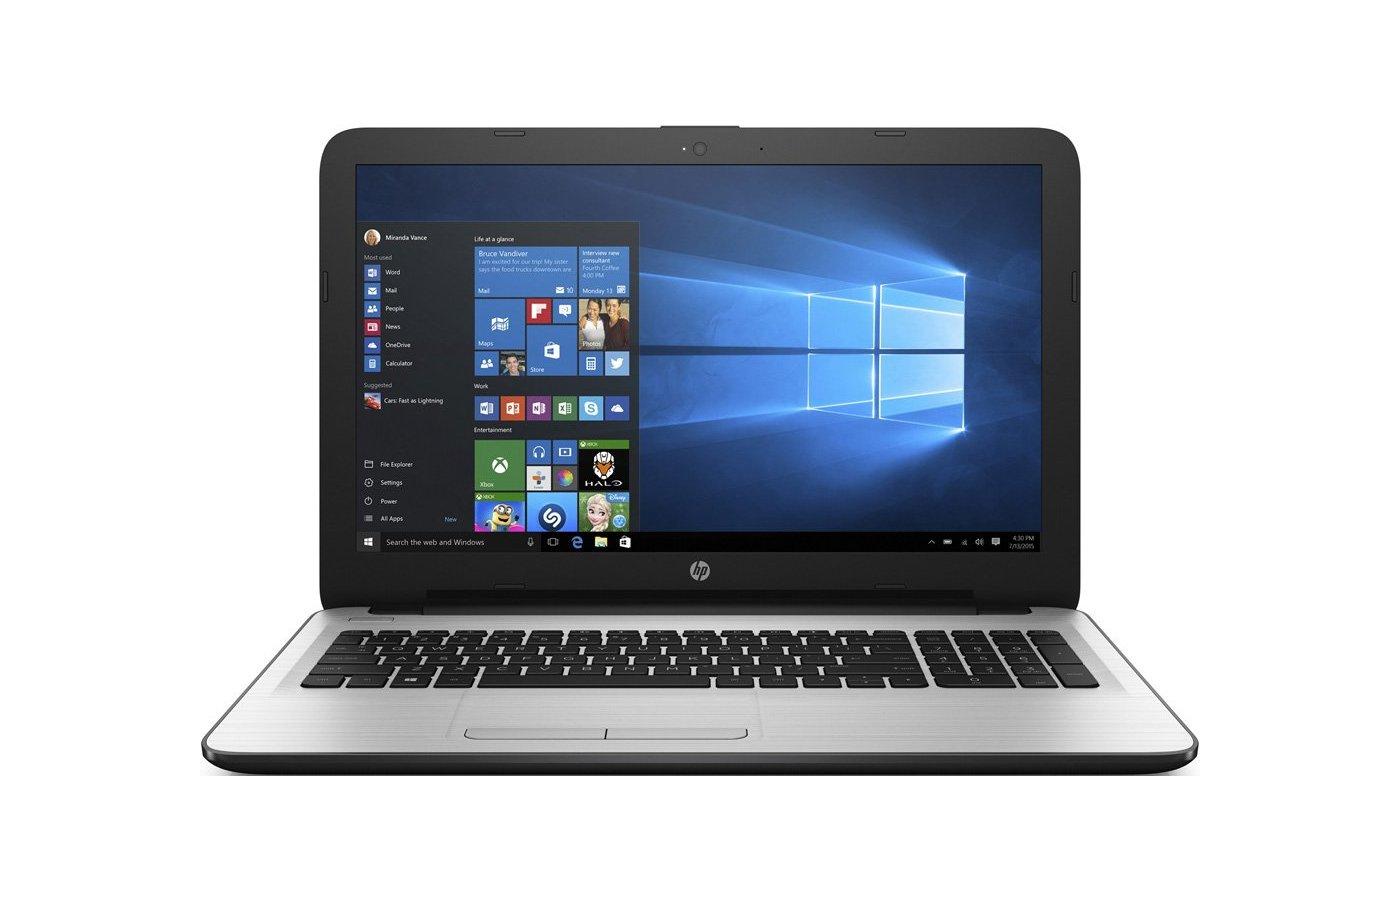 Ноутбук HP 15-ba502UR /Y5M19EA/ AMD E2 7110/4Gb/500Gb/15.6/WiFi/Win10 (White)